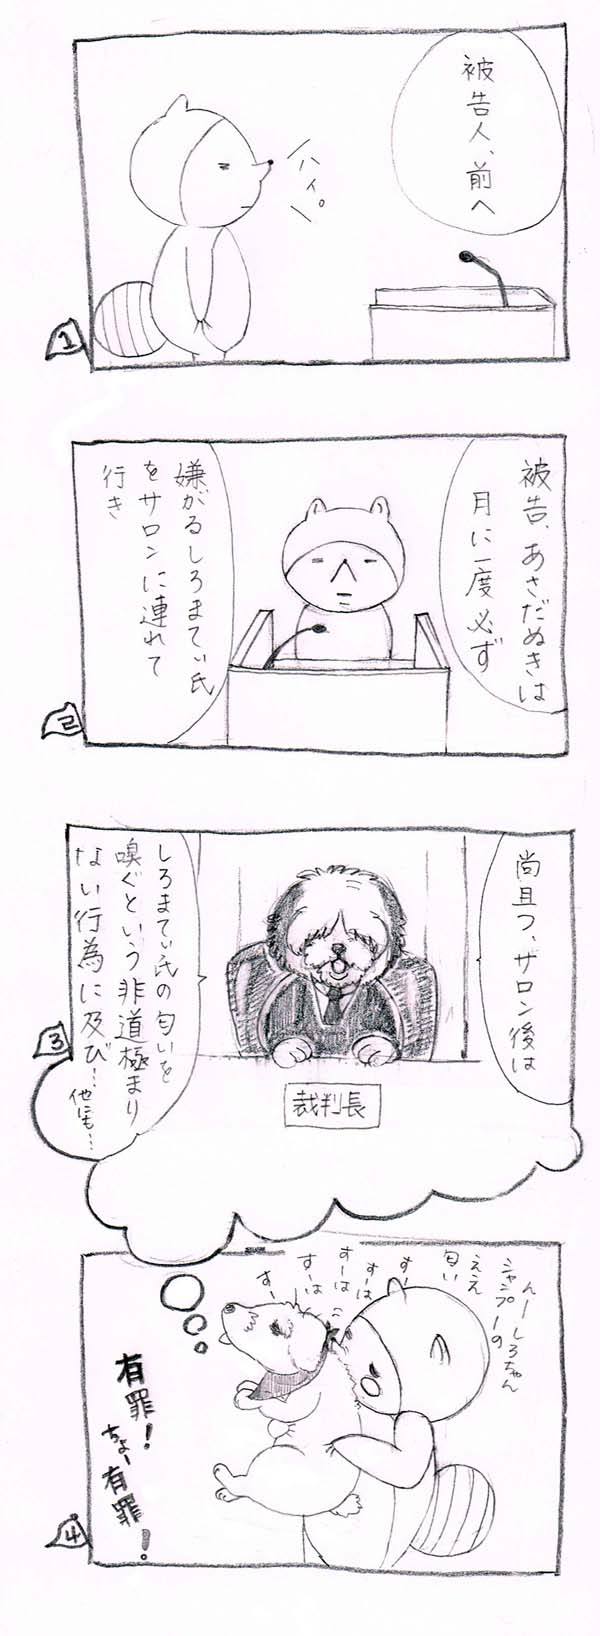 shiro_saiban.jpg